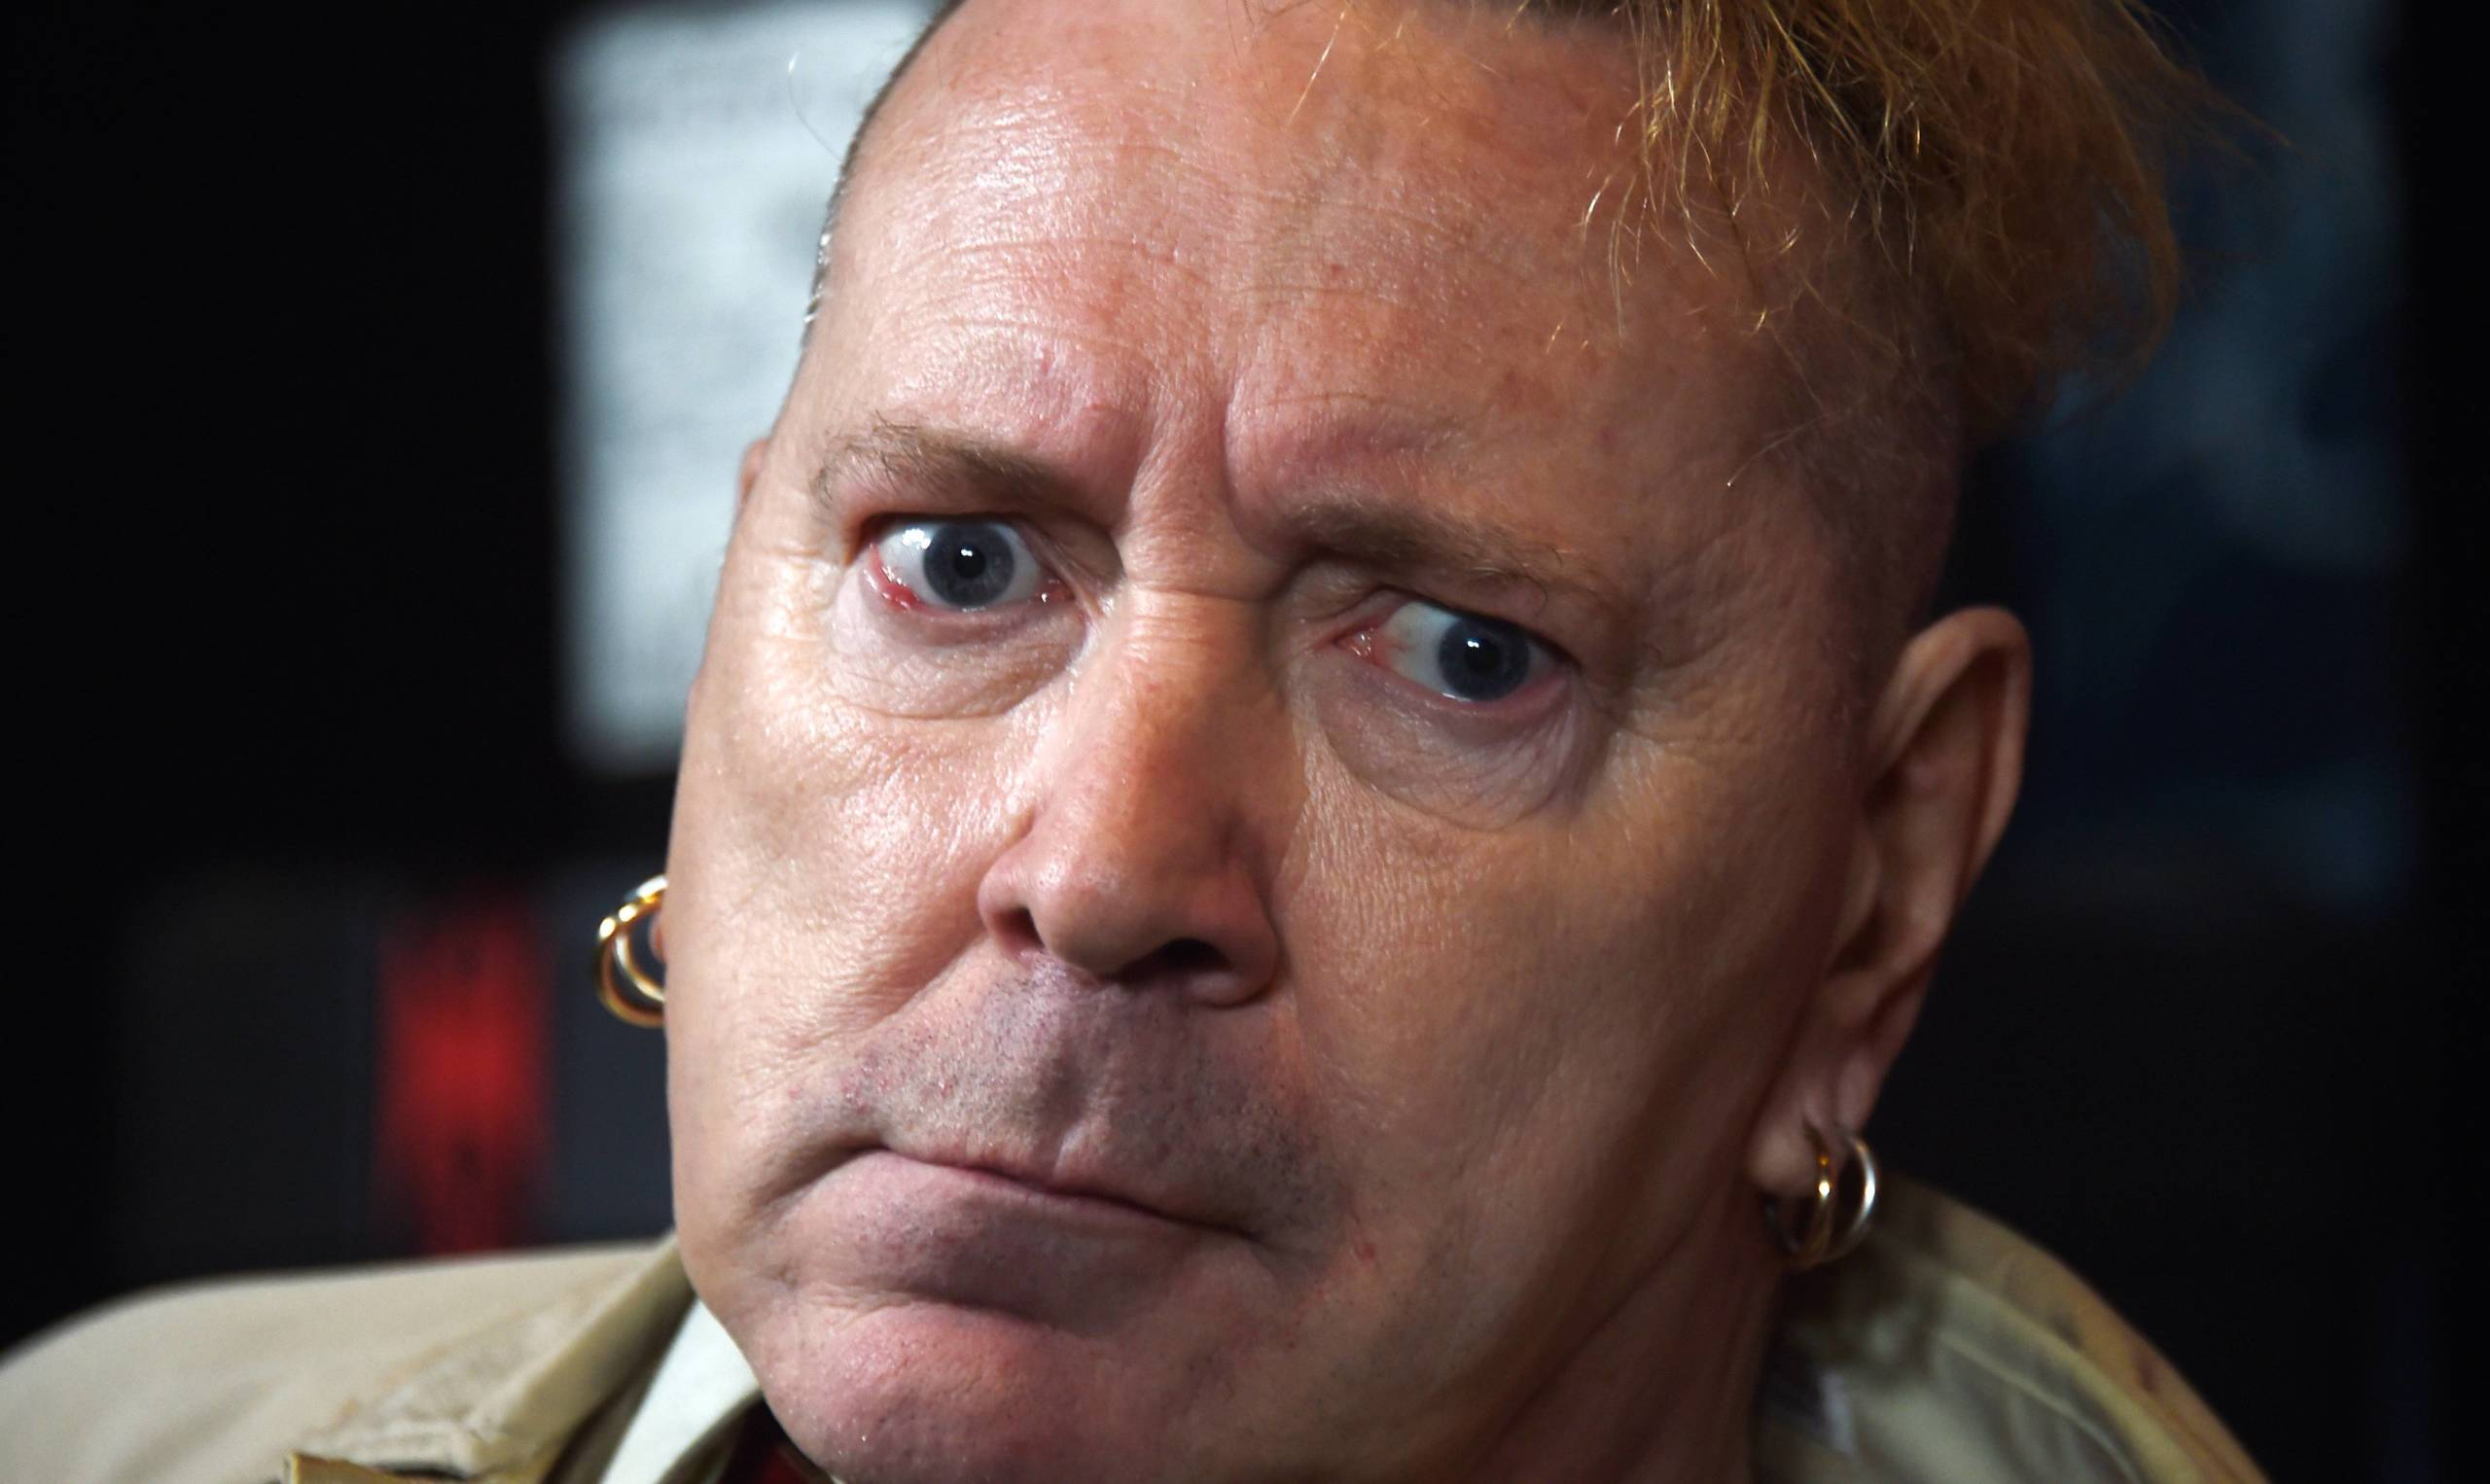 Johnny Rotten alias John Lydon ist seit 2013 US-Staatsbürger